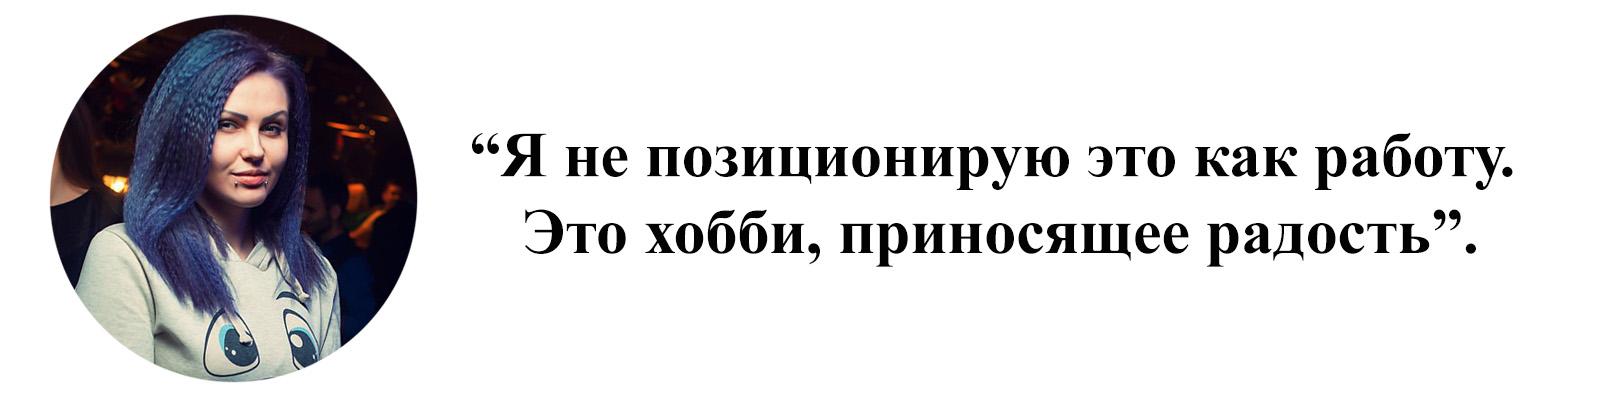 Lesya_Makas